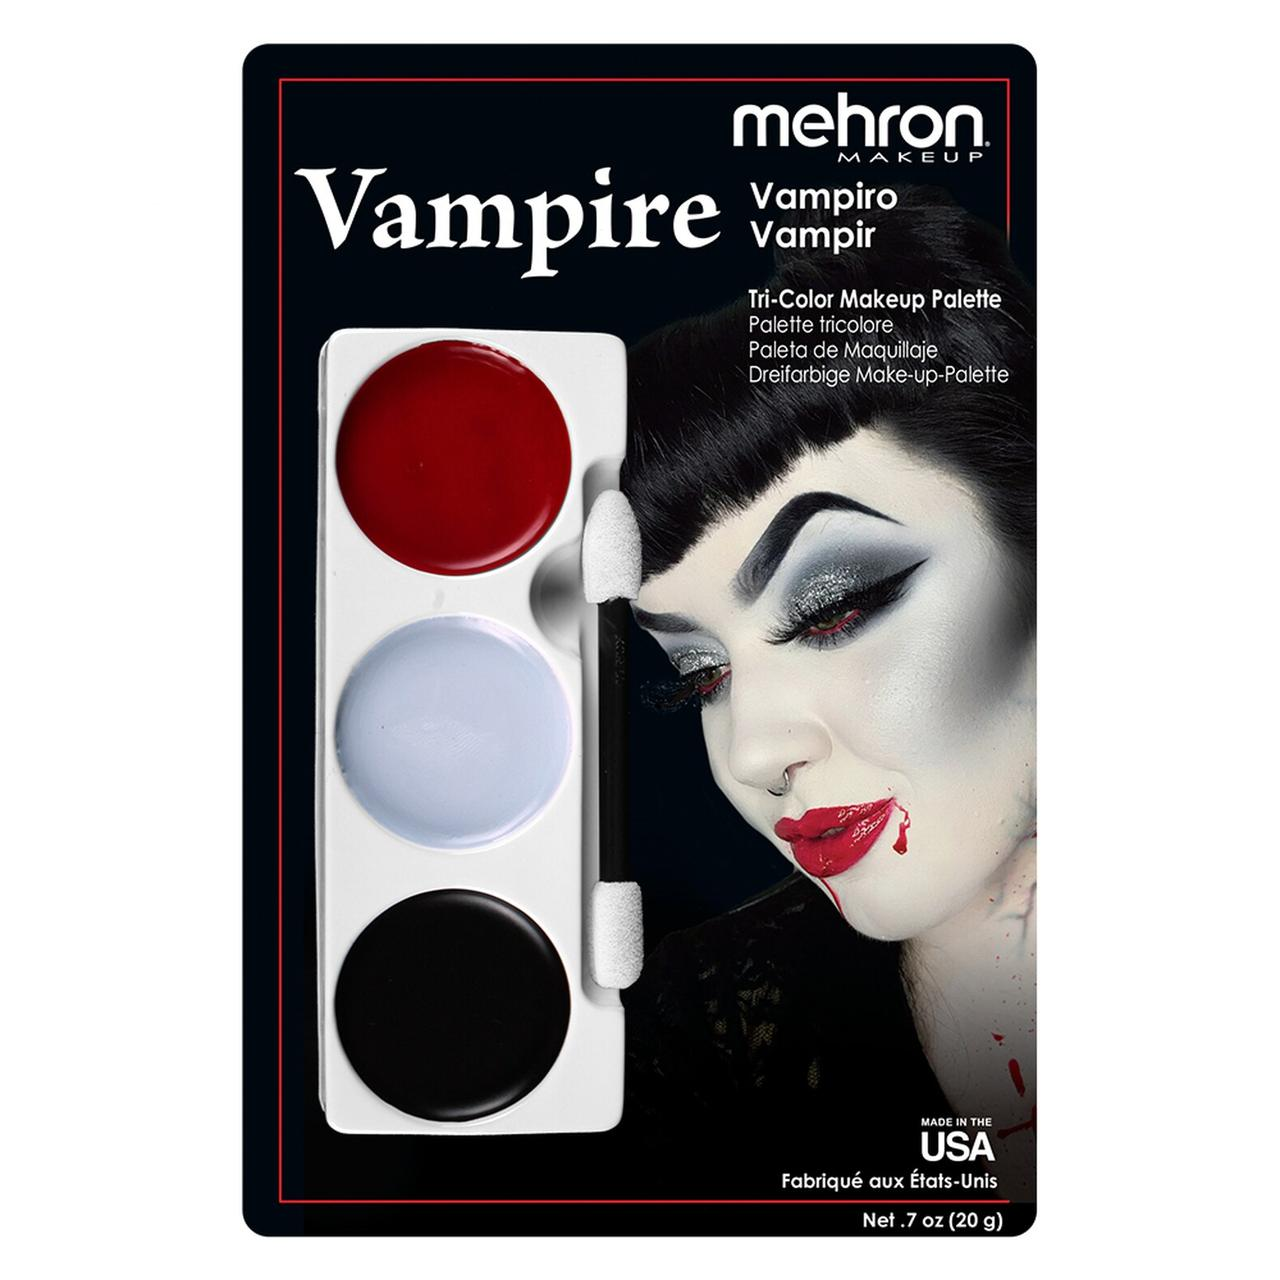 "MEHRON Набор кремового грима для образа ""Вампир"" Tri-Color Makeup Palette (Vampire), 6 oz., 17 г"